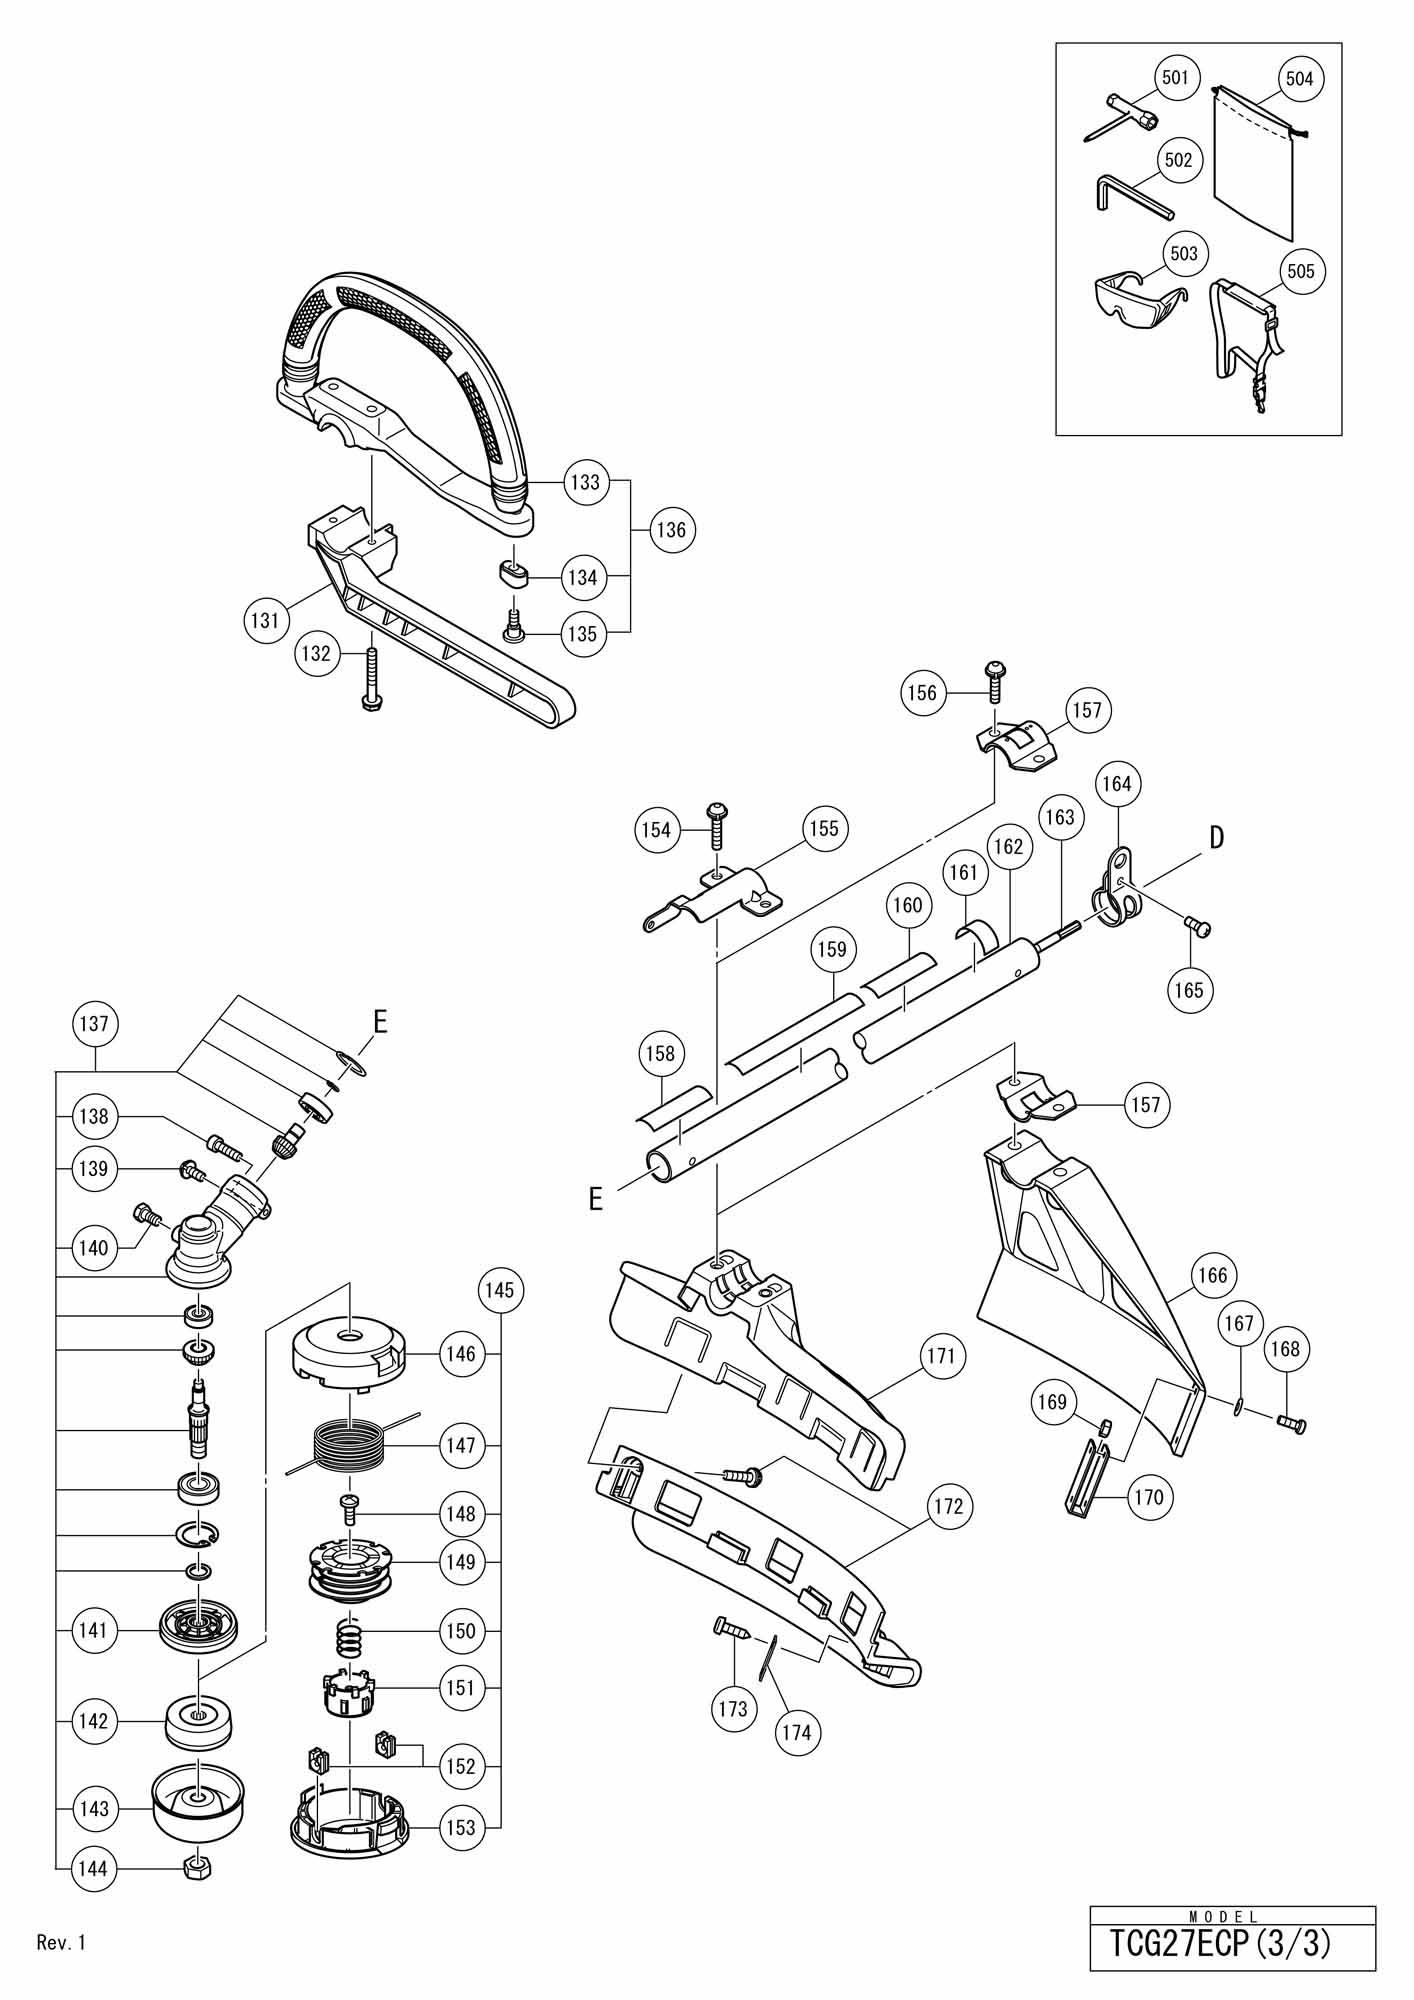 Spares For Hitachi Engine Grass Trimmer Brush Cutter Tcg 27ecp Ecp Wiring Diagram Click Bigger